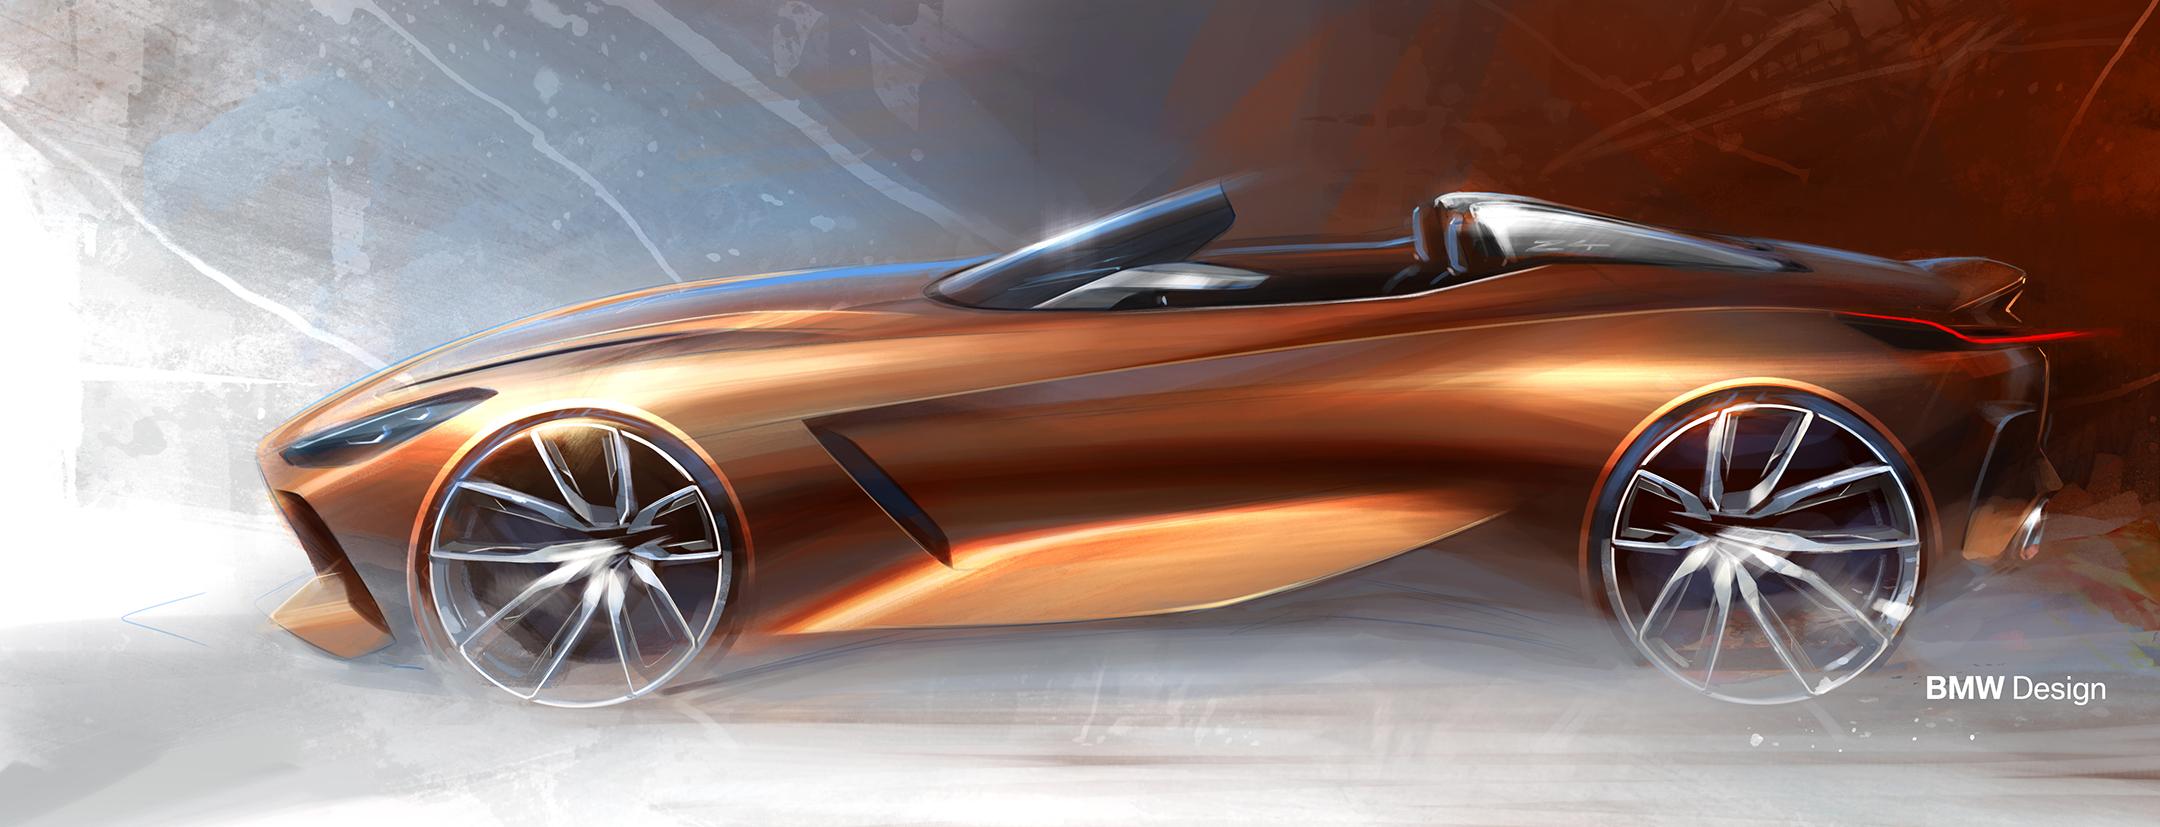 BMW Concept Z4 - 2017 - sketch - side-face / profil